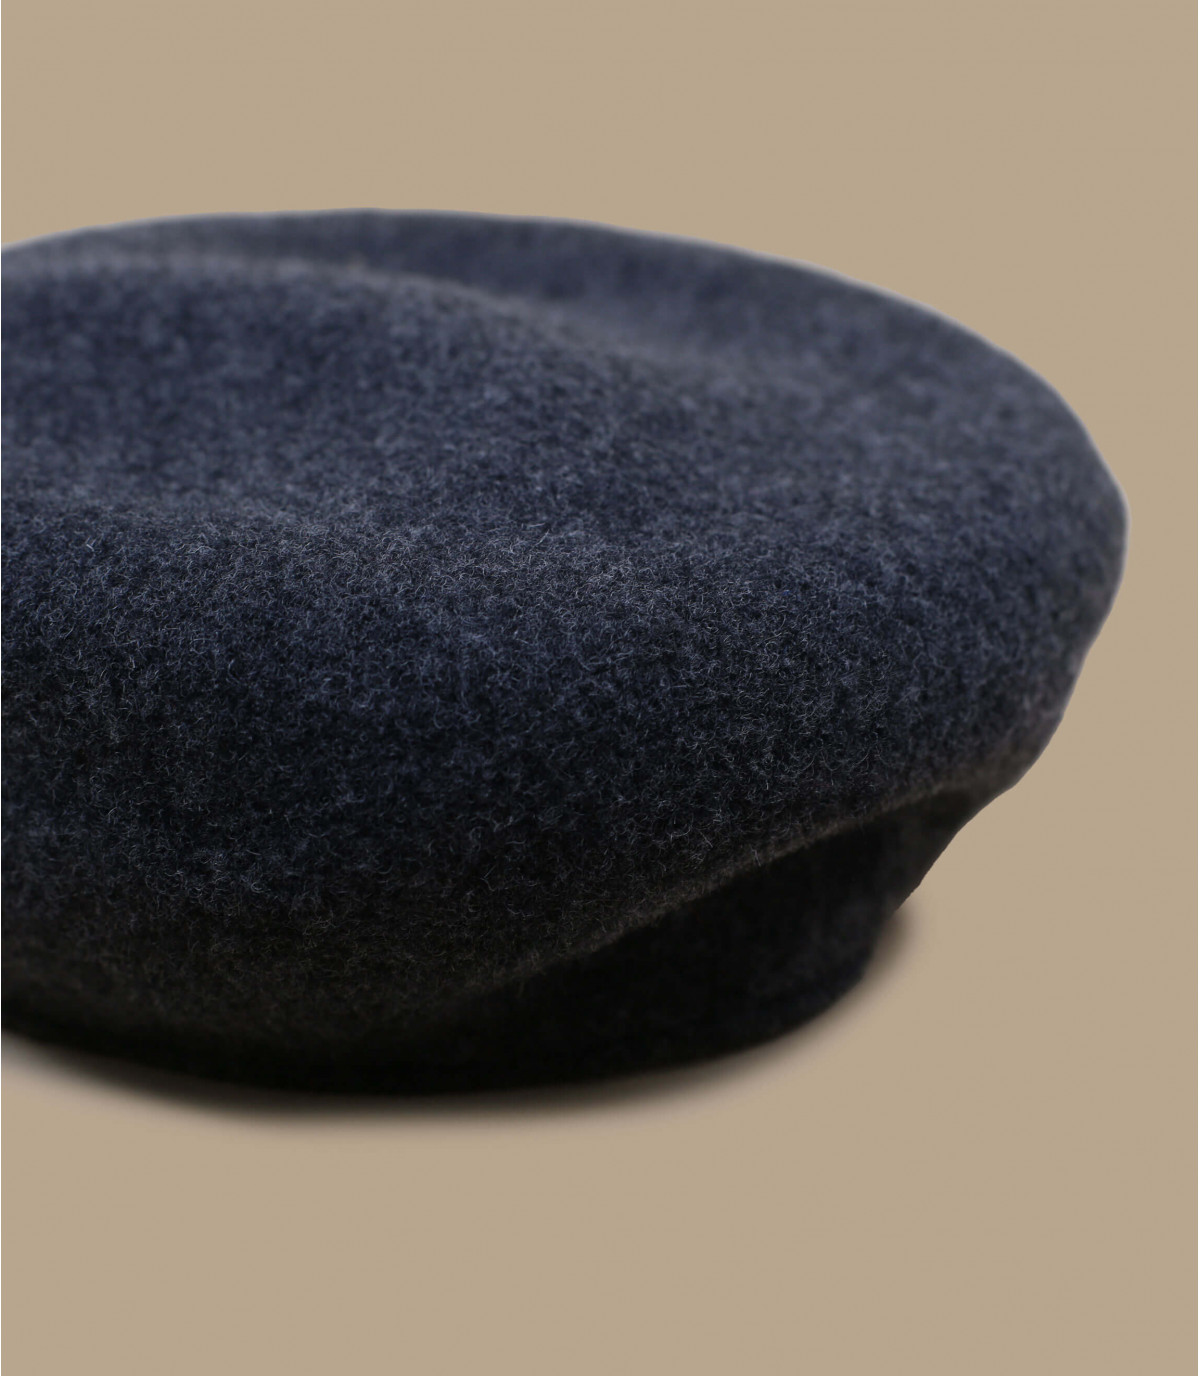 Detalles Boiled Wool cap anthracite imagen 2